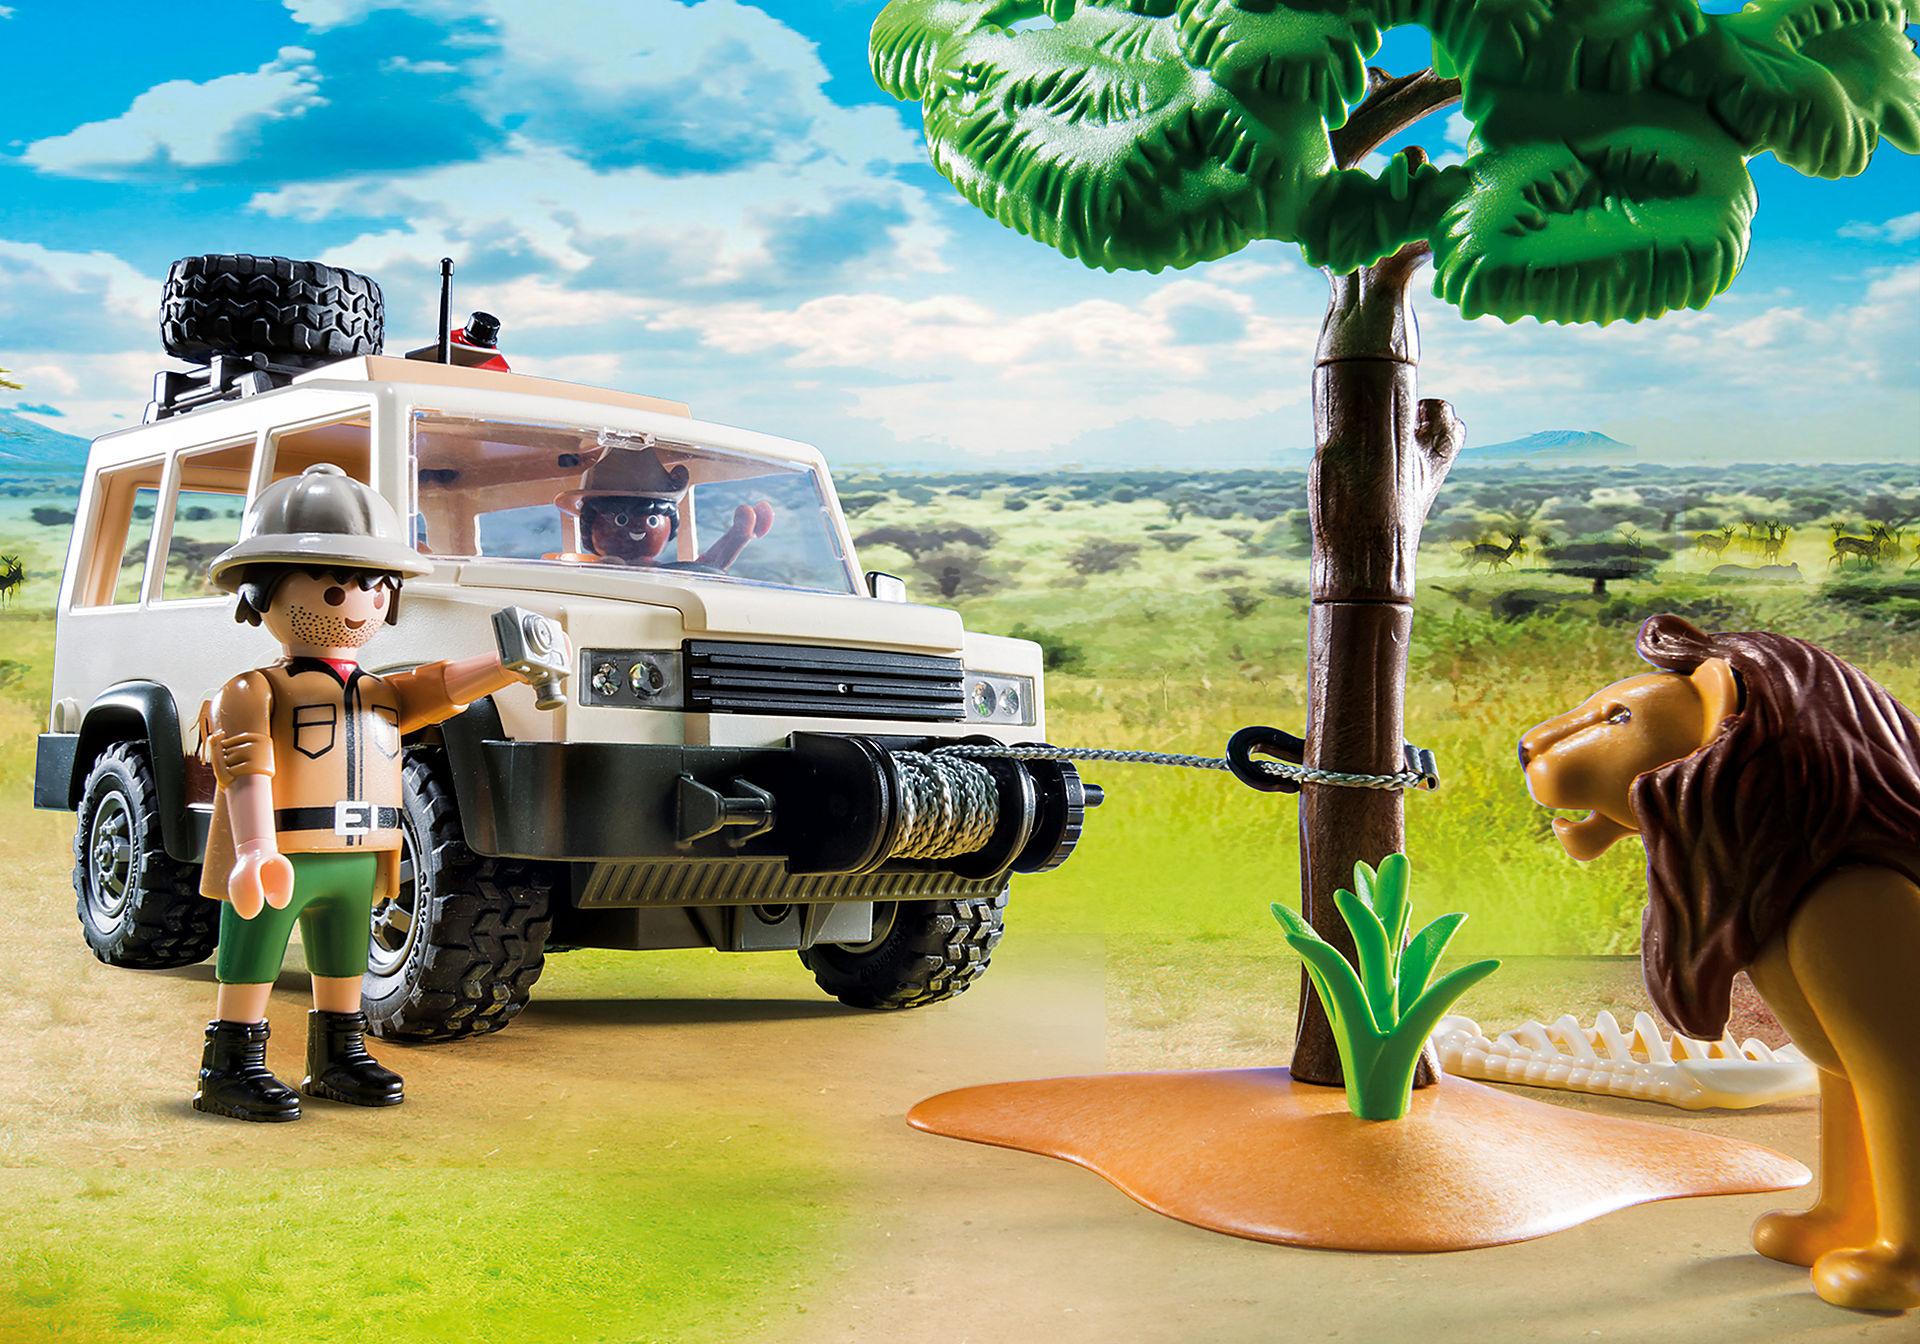 http://media.playmobil.com/i/playmobil/6798_product_extra1/Safari-Geländewagen mit Seilwinde